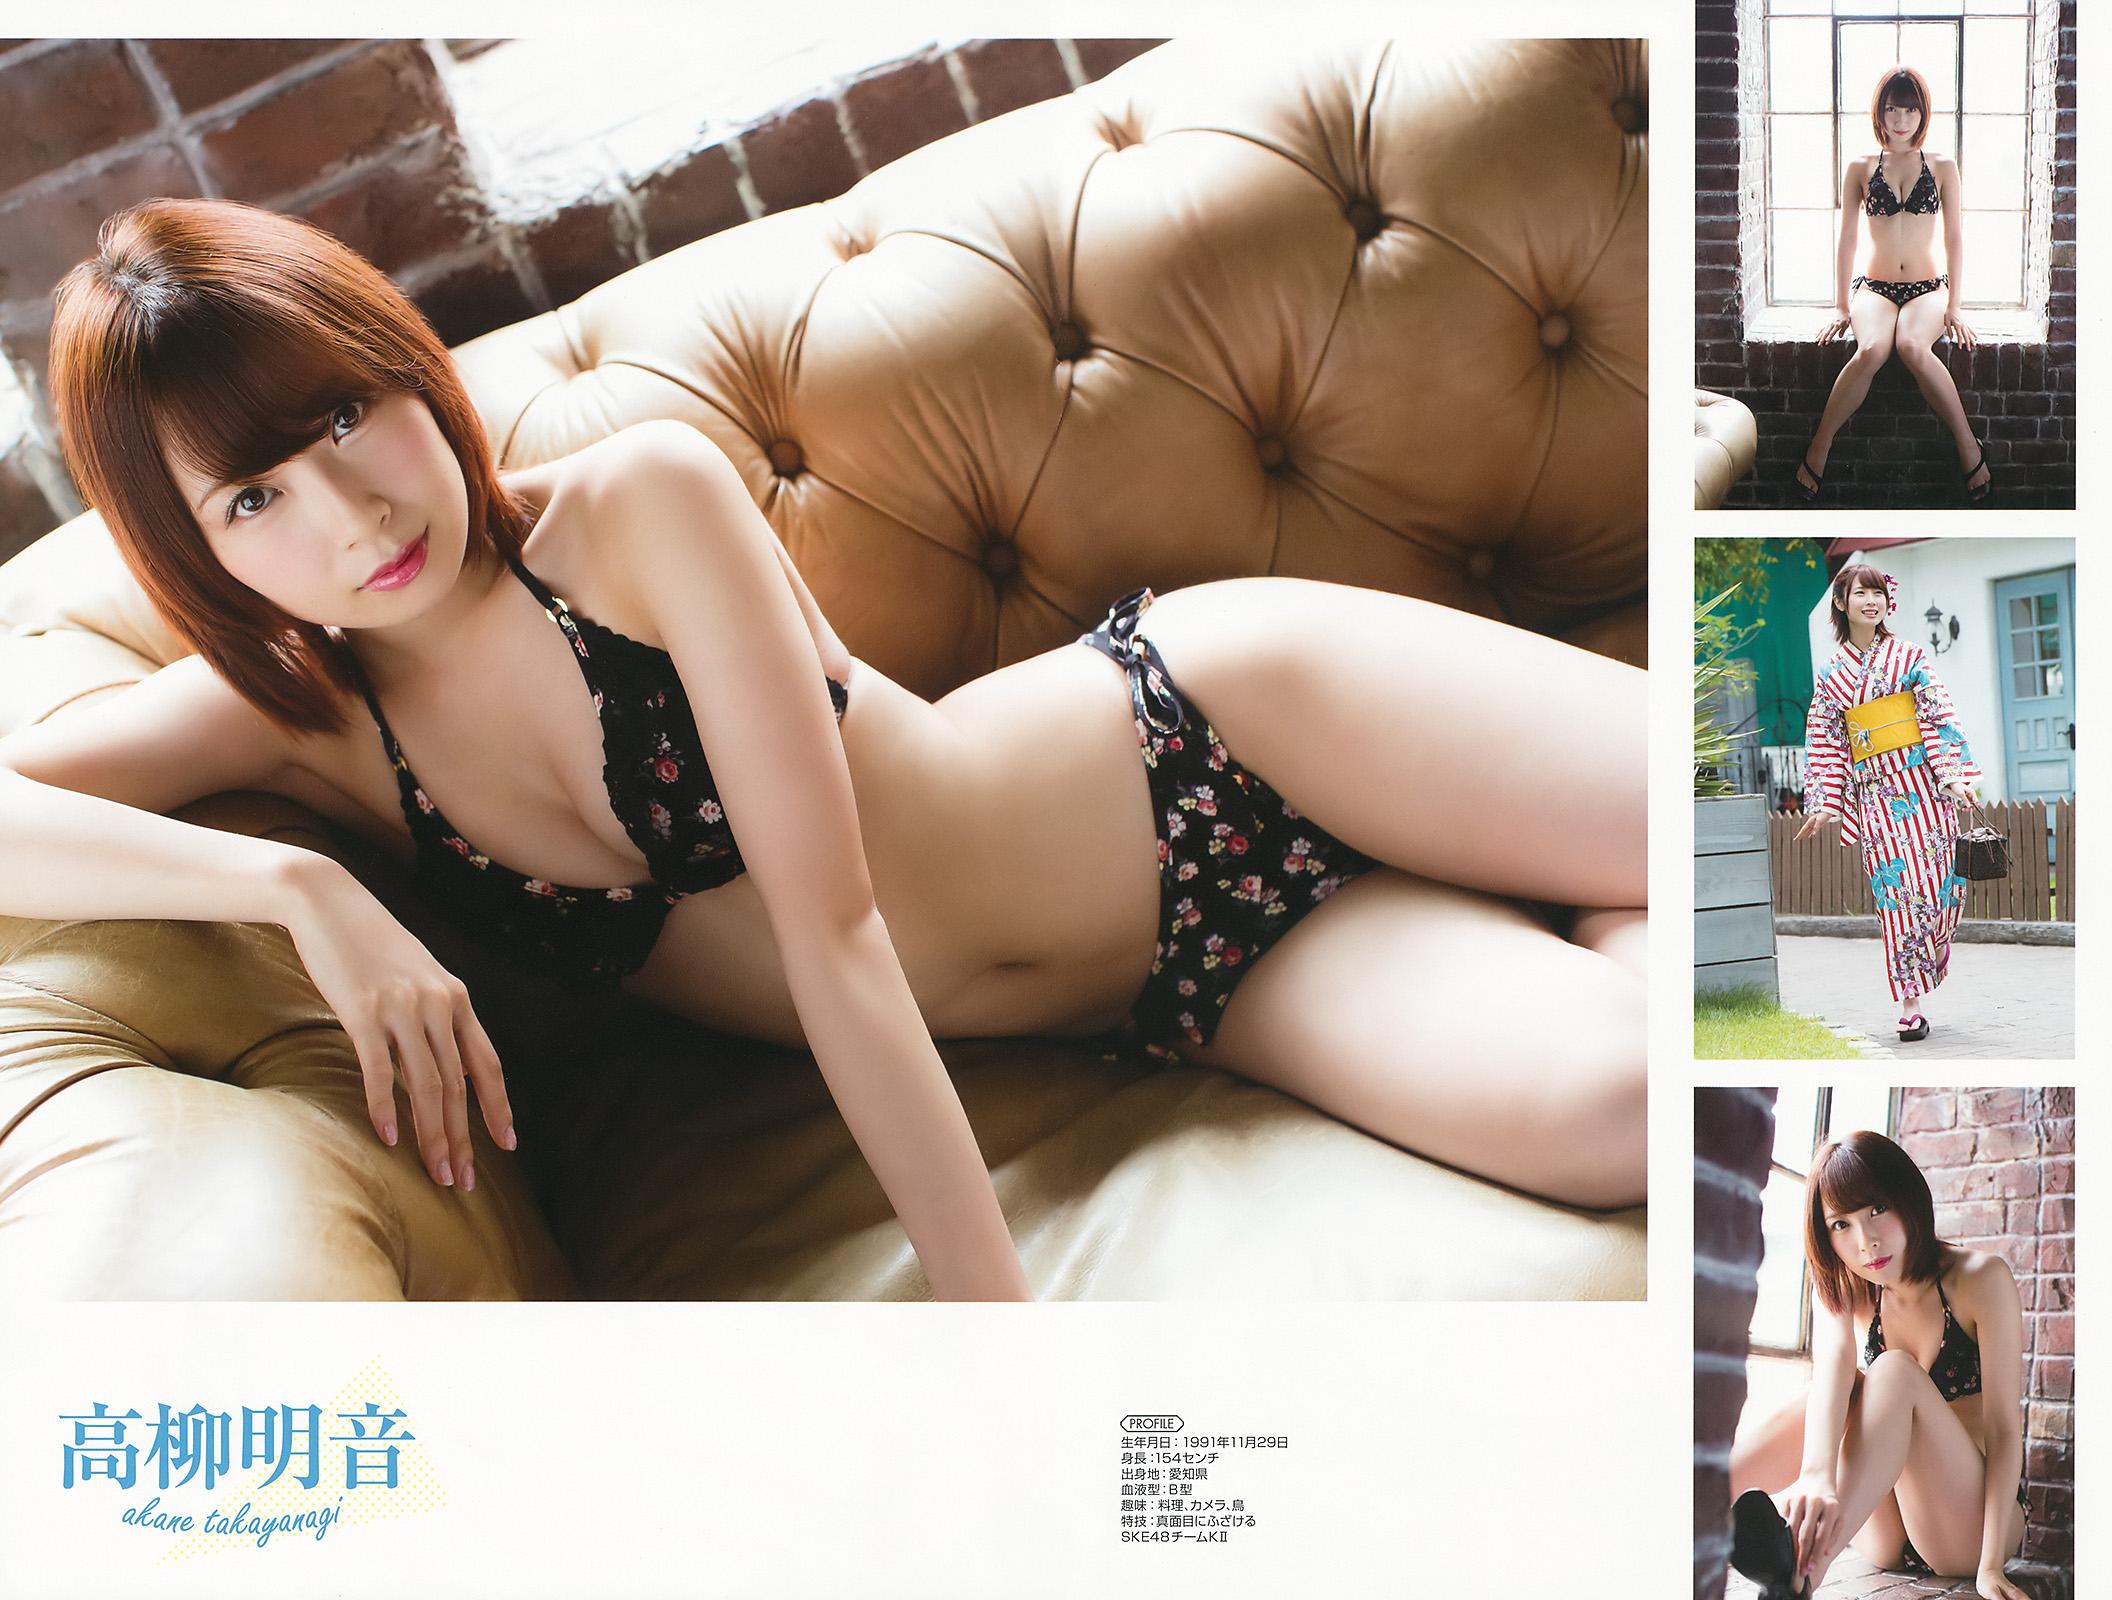 [Young Gangan] 2017 No.16 Yuna Obata (小畑優奈 他) - Girlsdelta